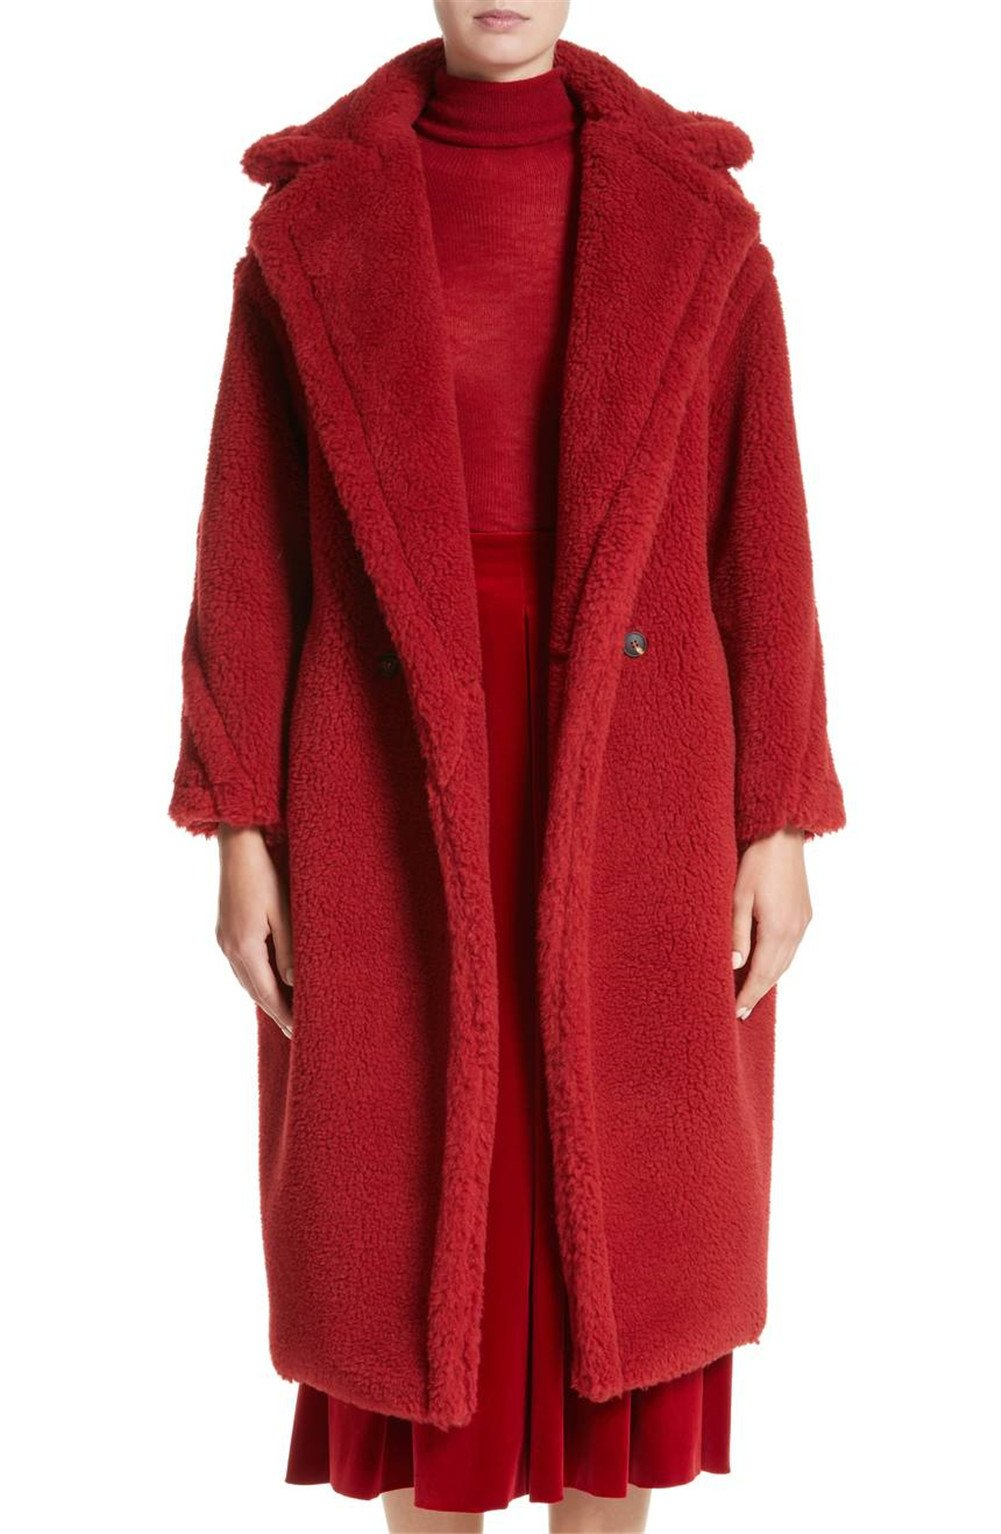 TEXAS, FOOTBALL COUNTRY Women's Luxury Long Warm Fuzzy Cozy Faux Fur Teddy Bear Coat - Red/L